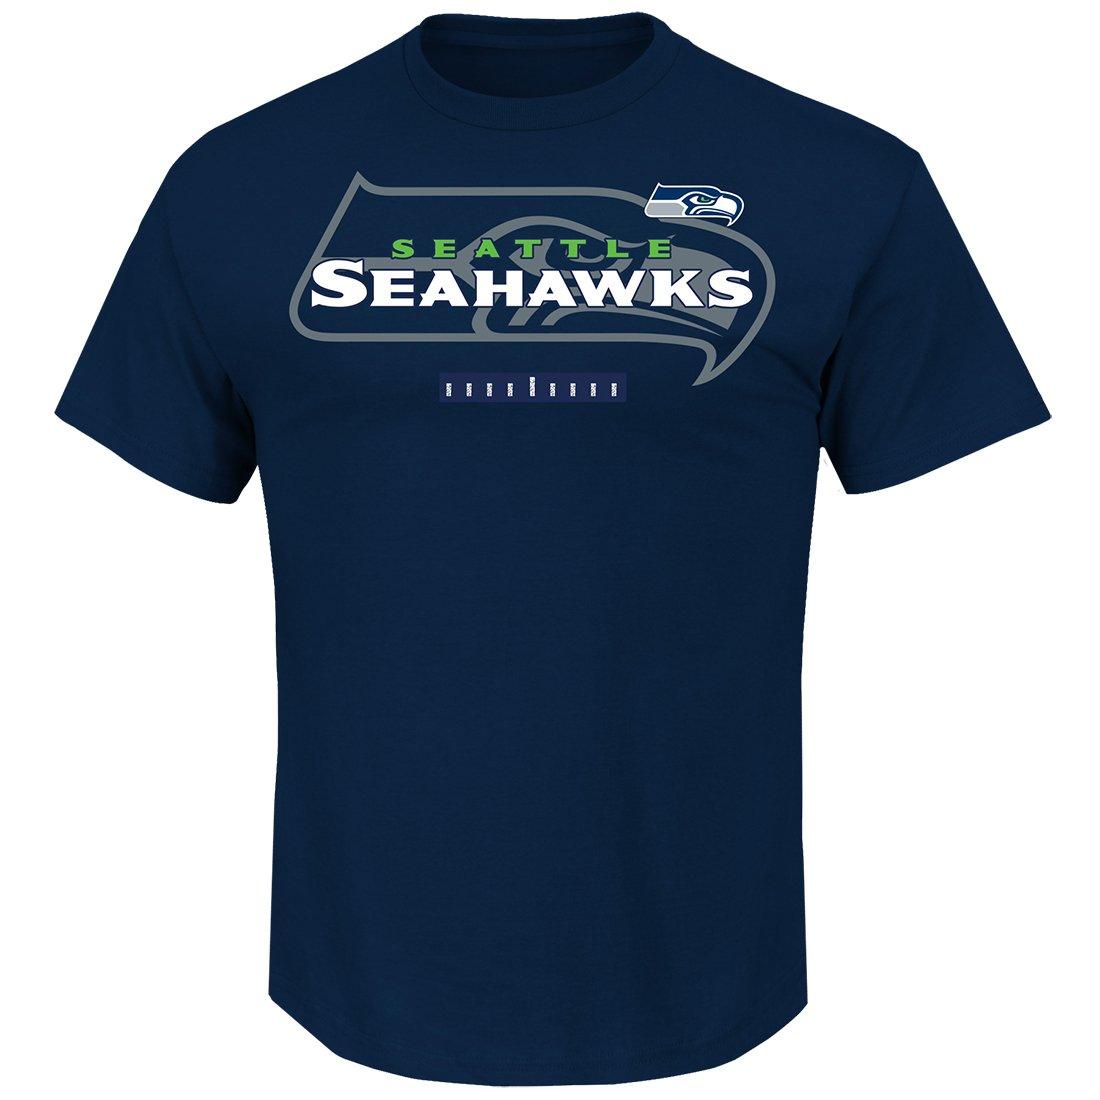 Seattle Seahawks Majestic NFL Of Great Value Men's Short Sleeve T-Shirt